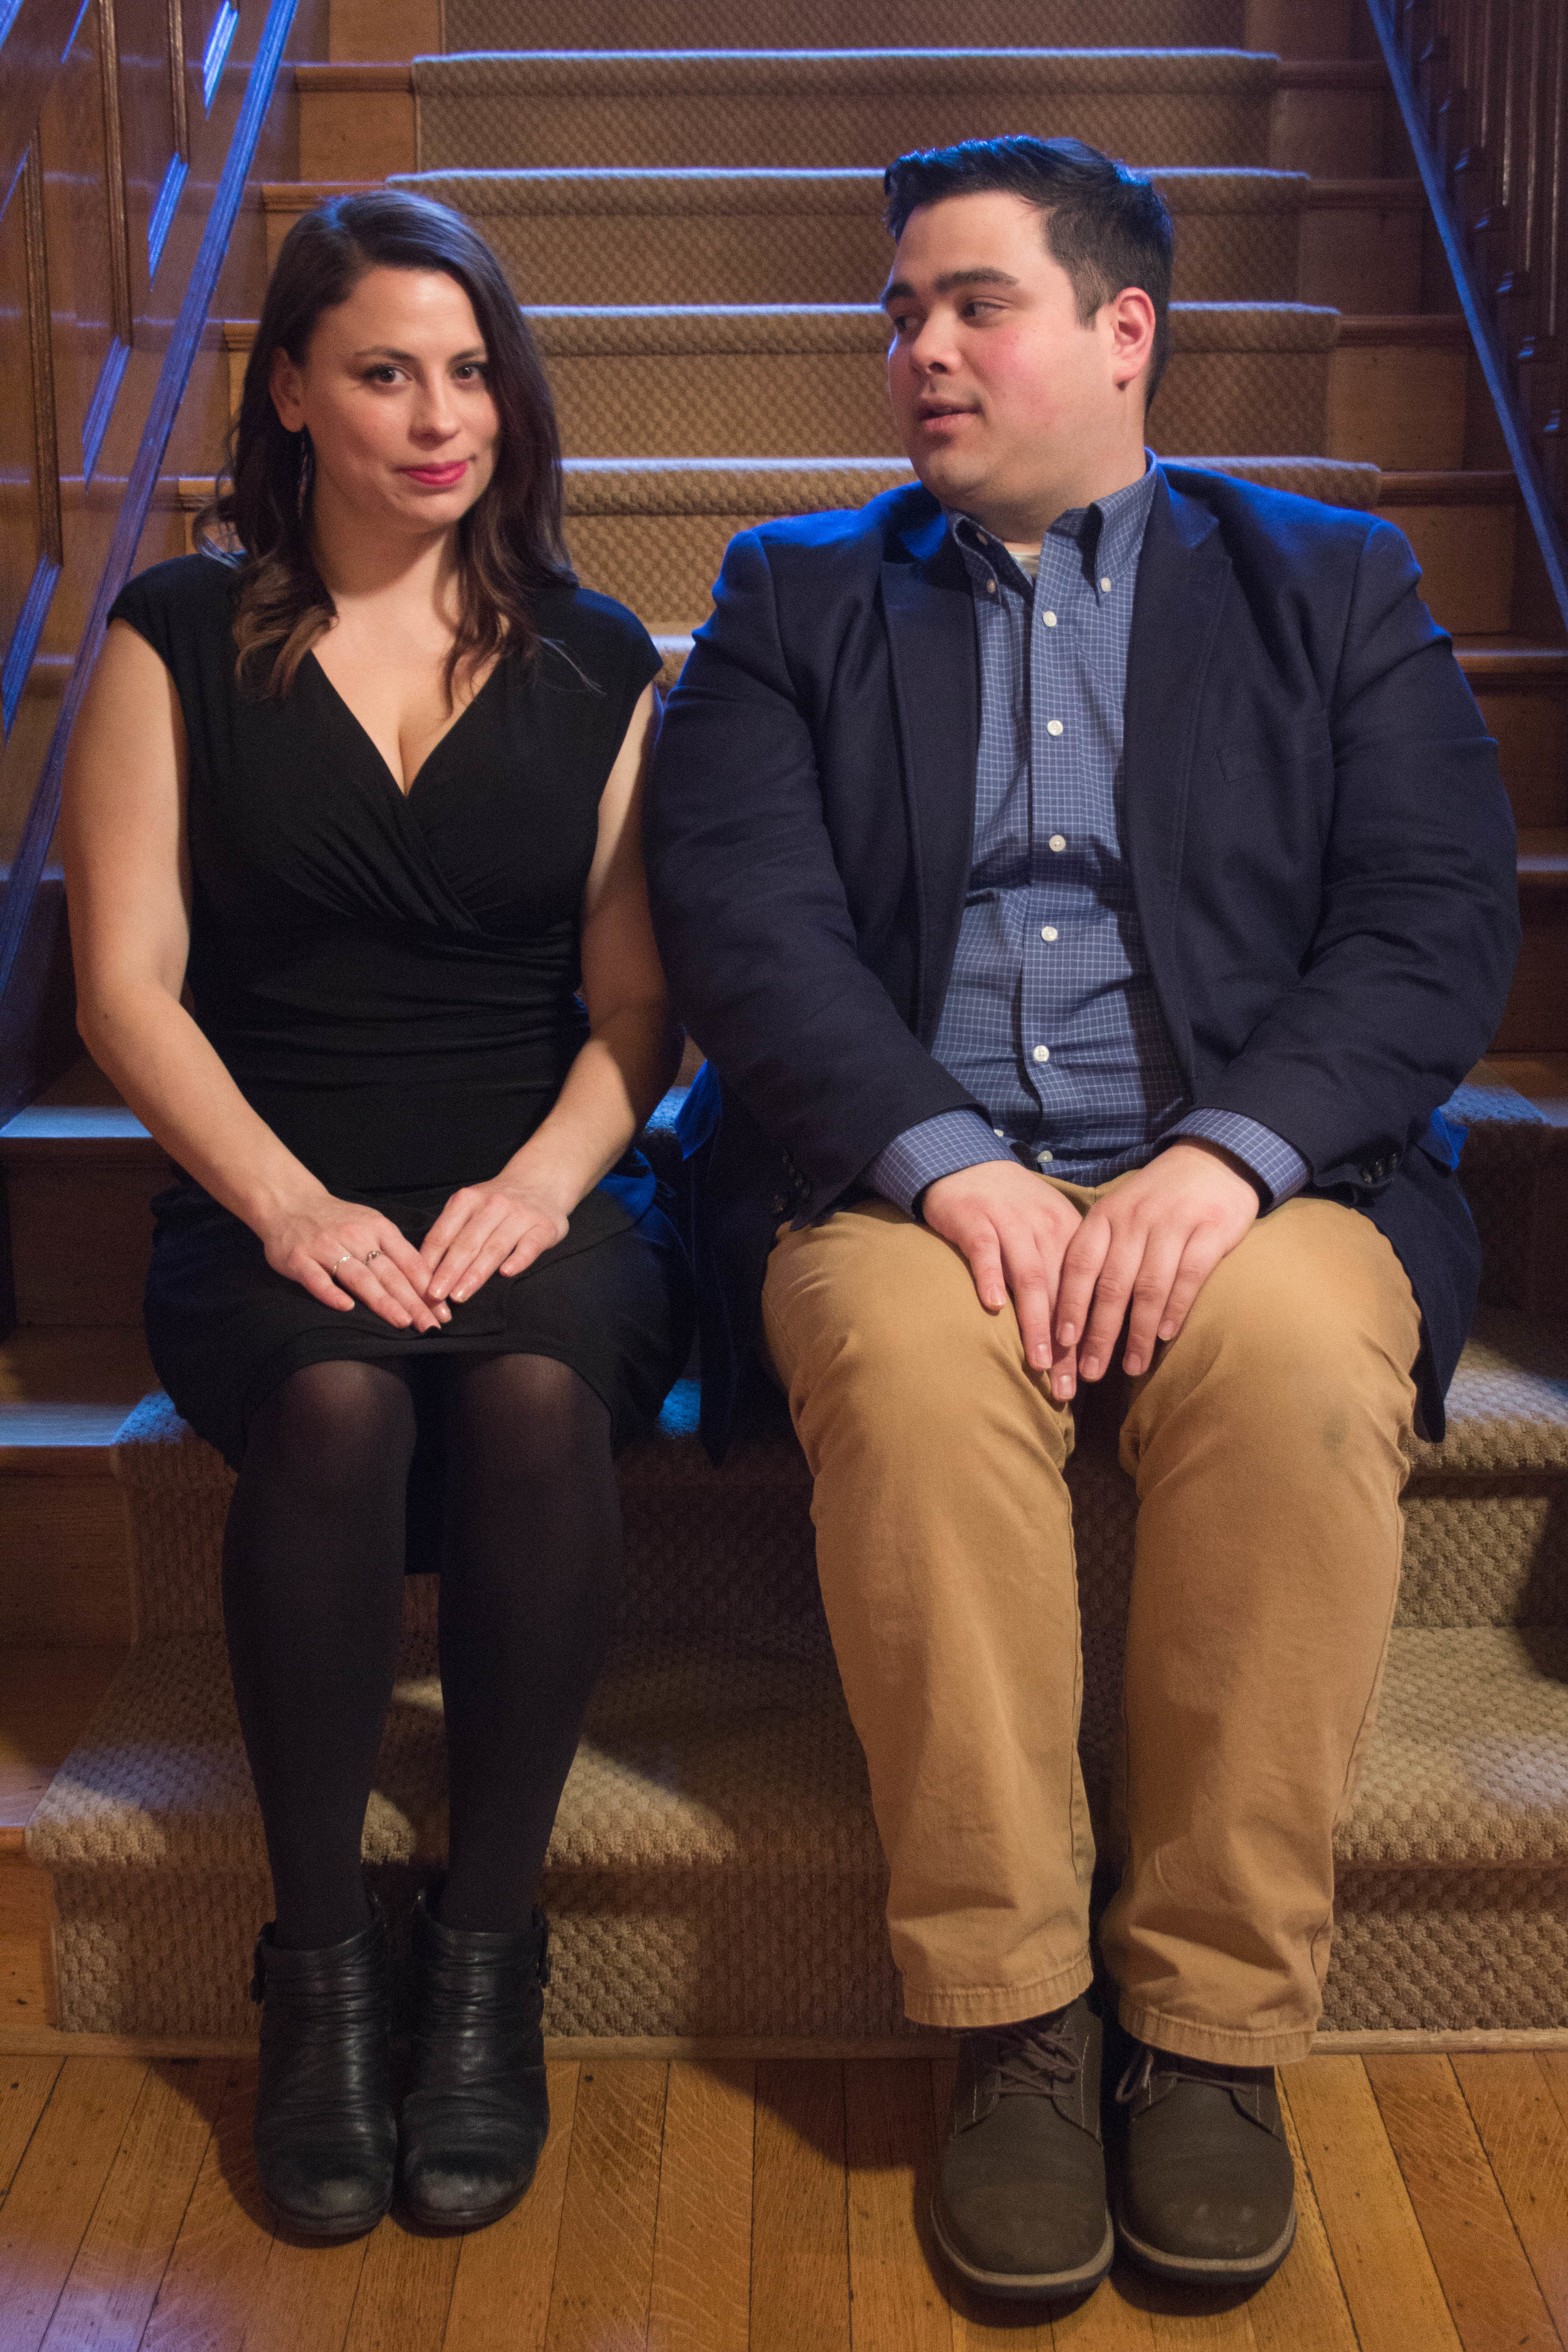 Katie Bicknell and Mario Orallo-Molinaro as Rosencrantz/Guildenstern.